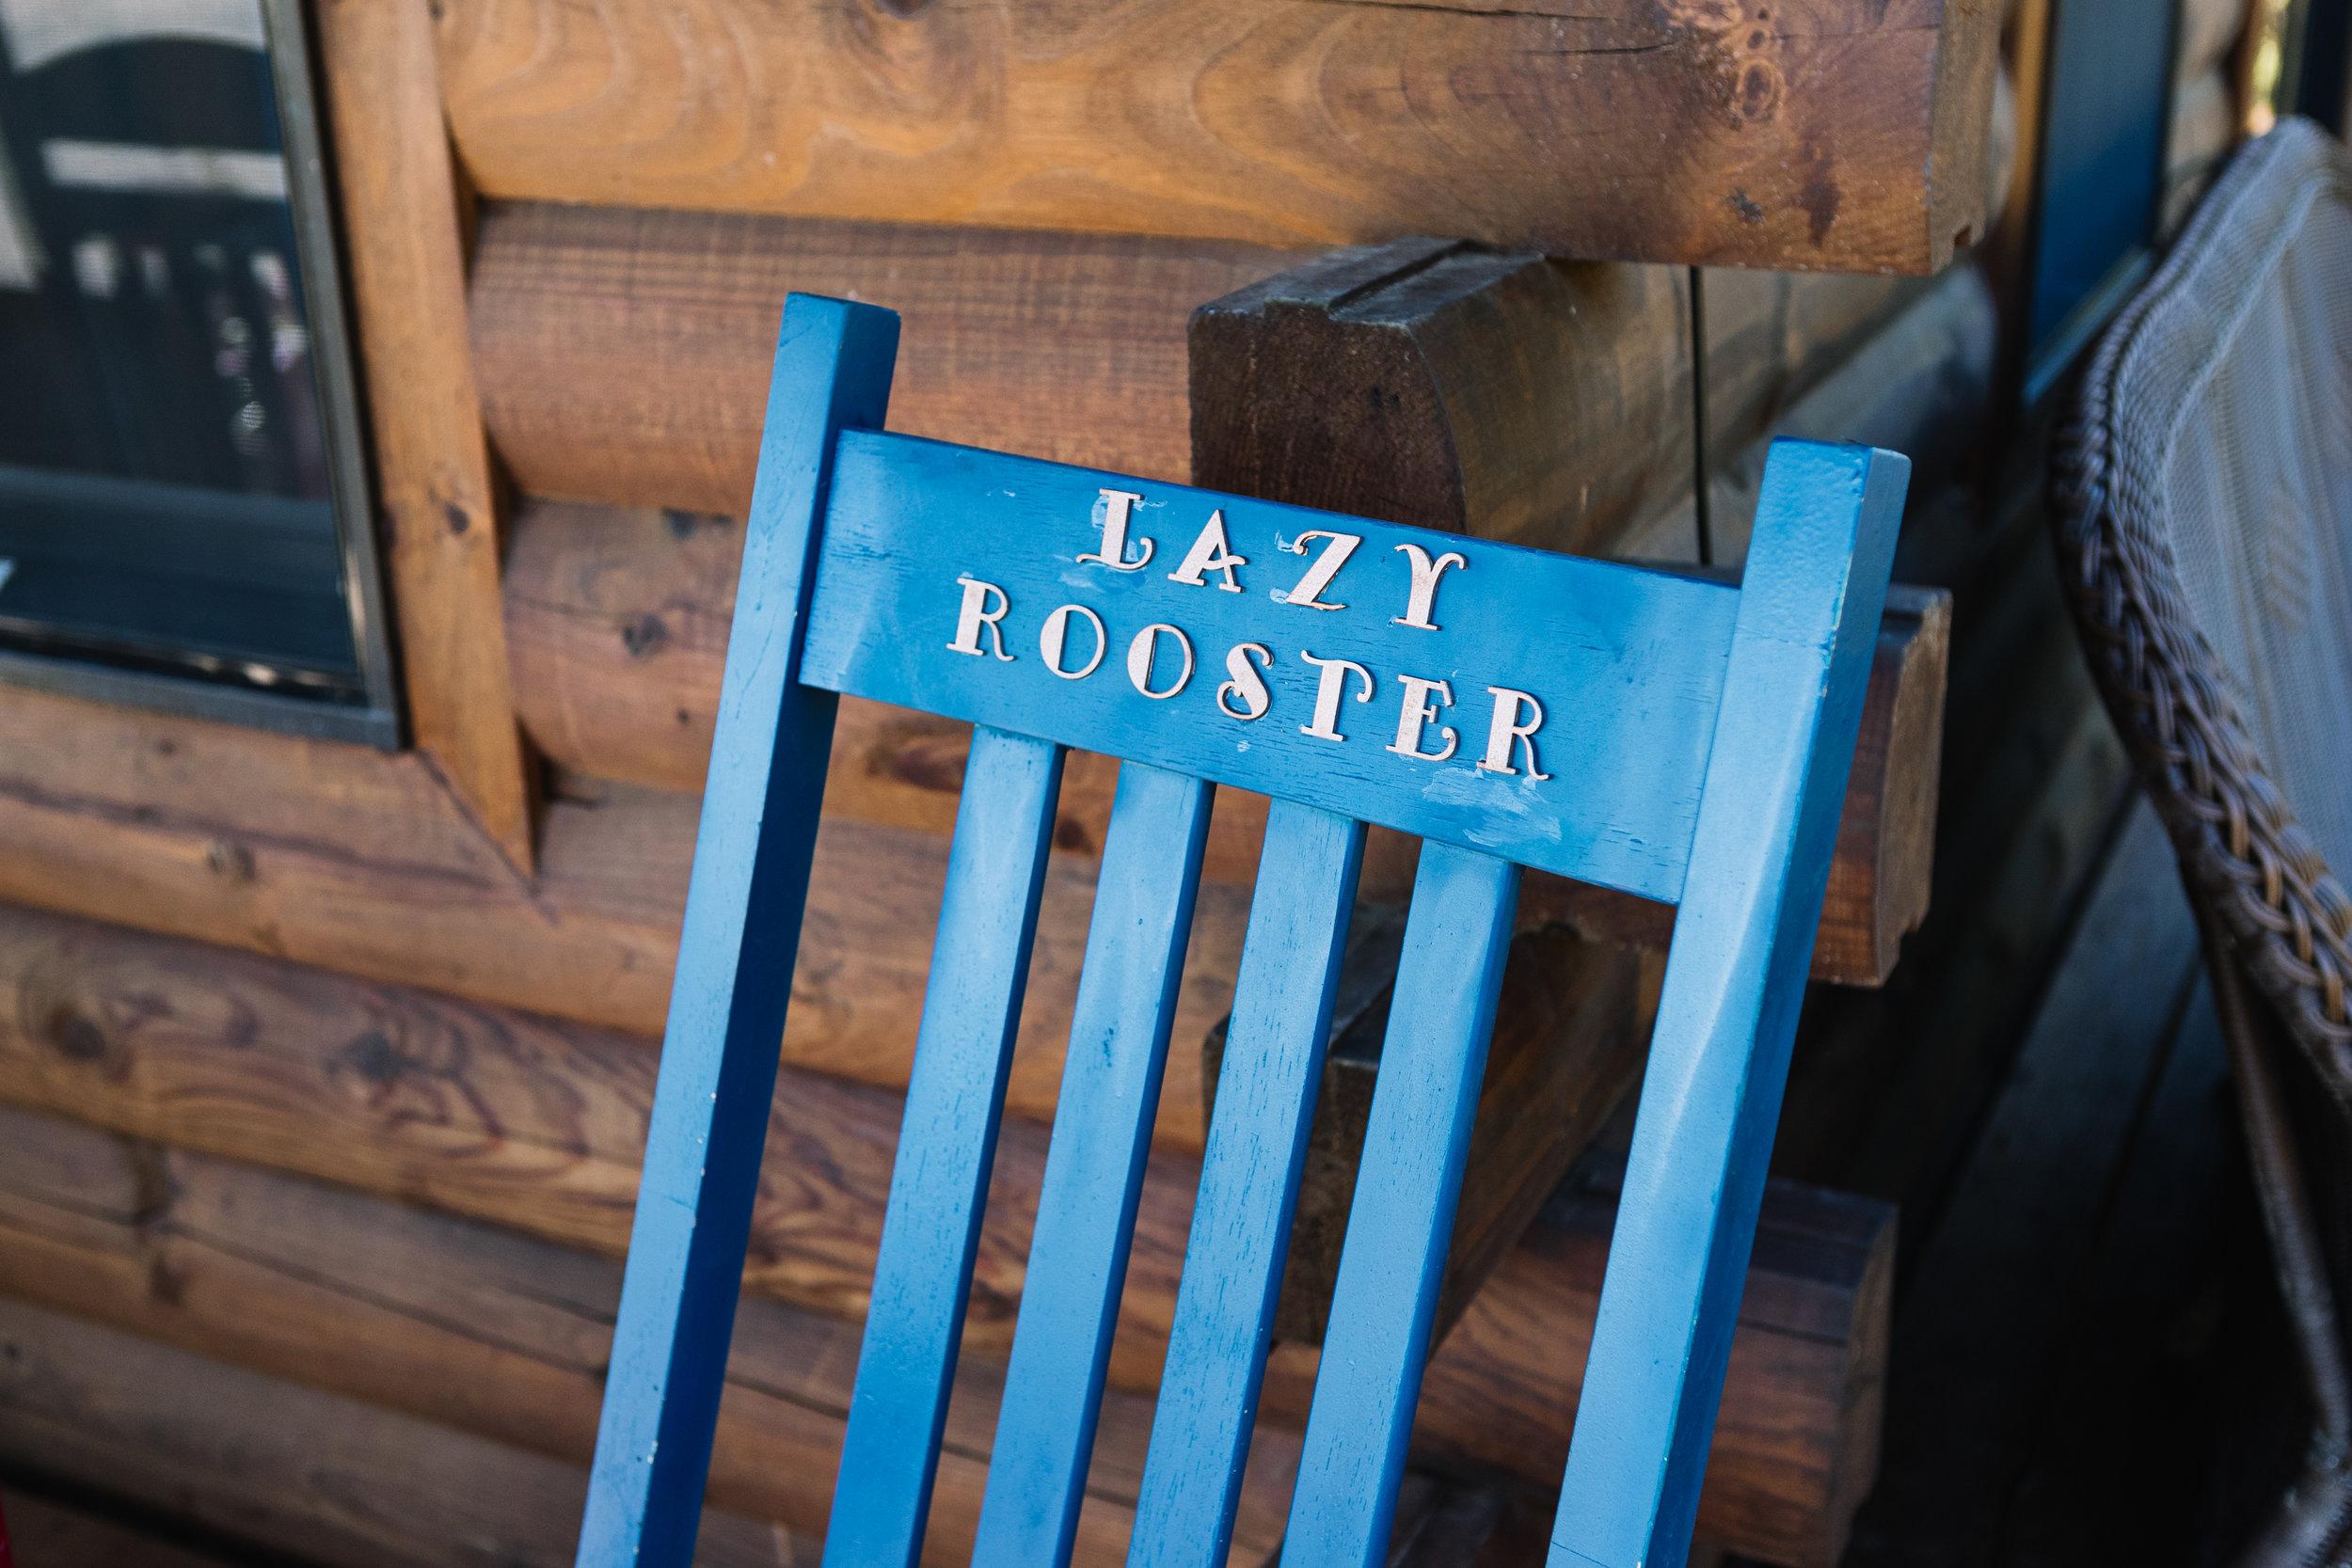 lazyrooster-7.jpg